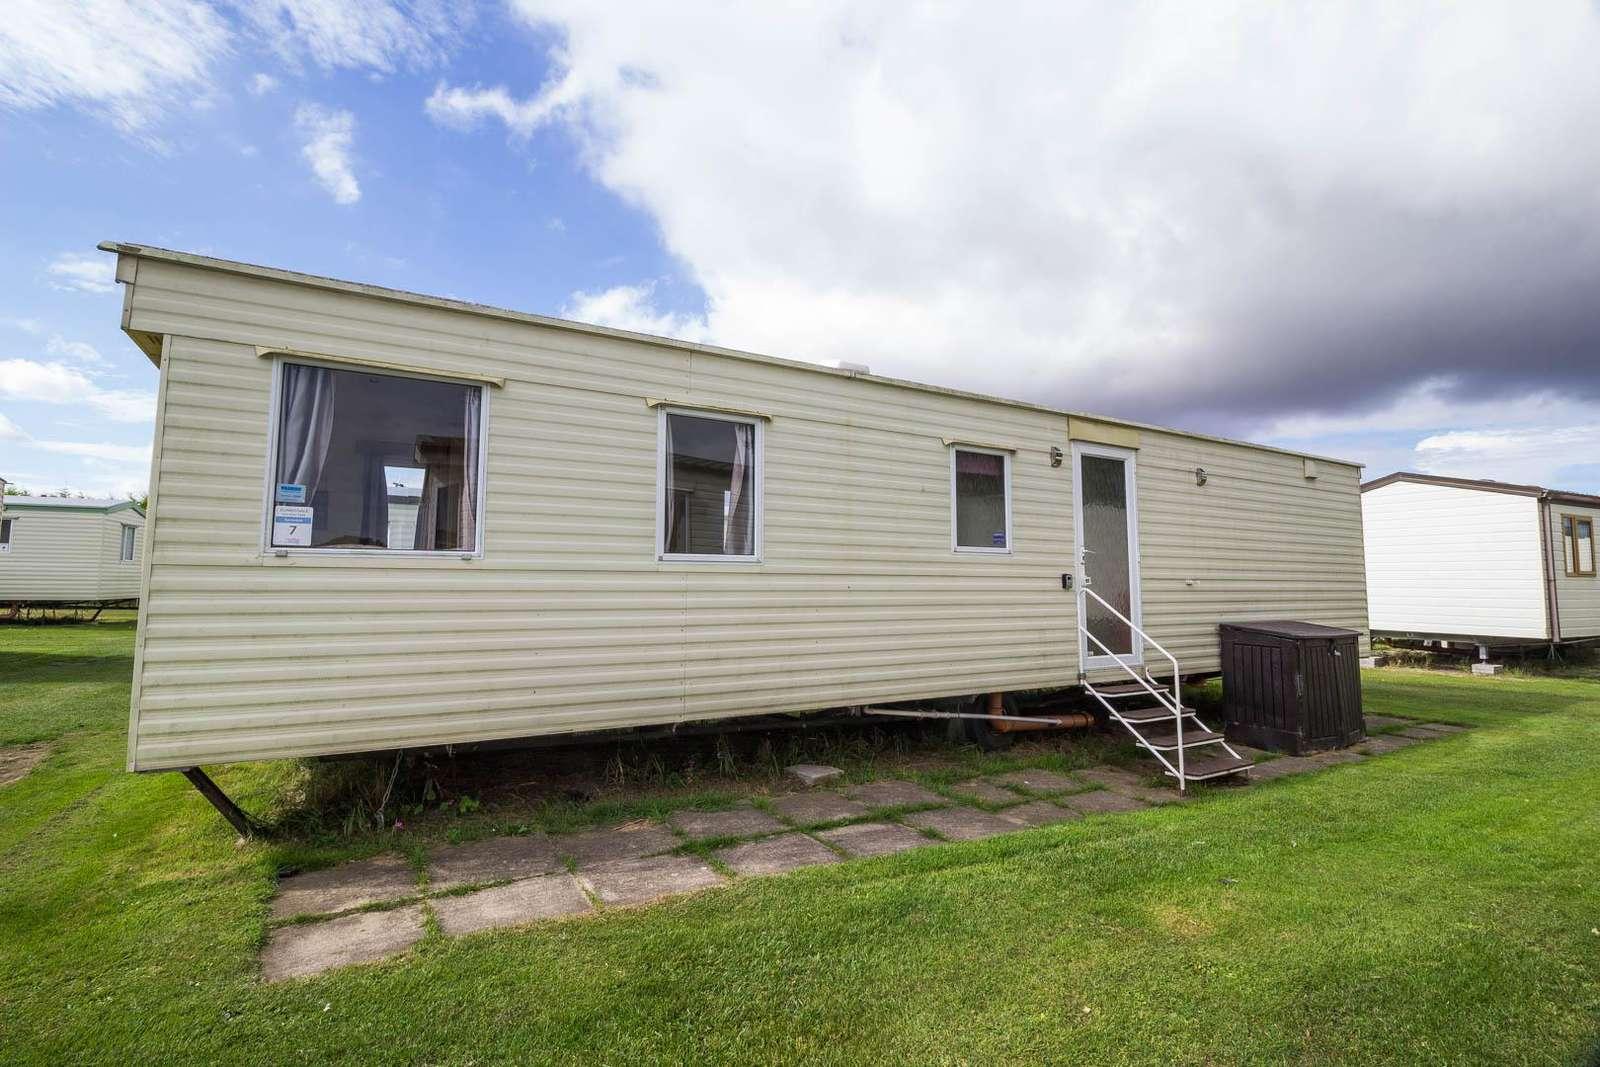 35007S – Sunnydale, 3 bed, 8 berth caravan. Emerald rated. - property